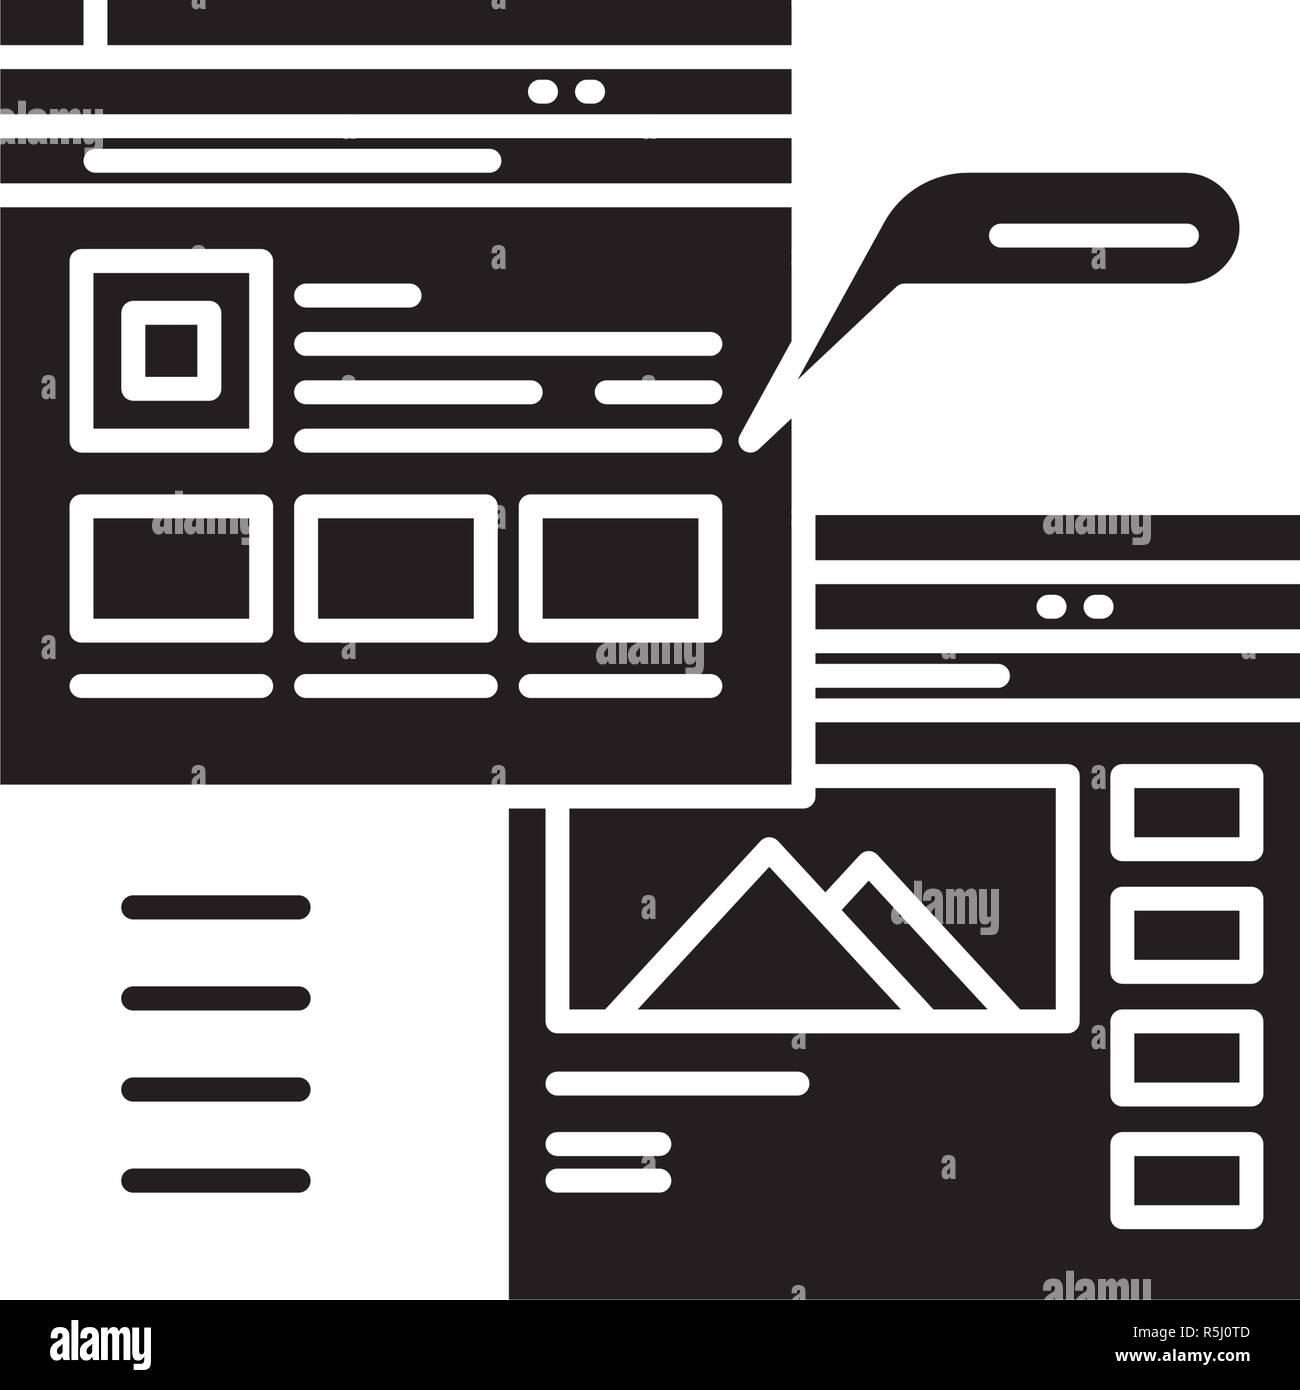 Webpage blogging black icon, vector sign on isolated background. Webpage blogging concept symbol, illustration  - Stock Image